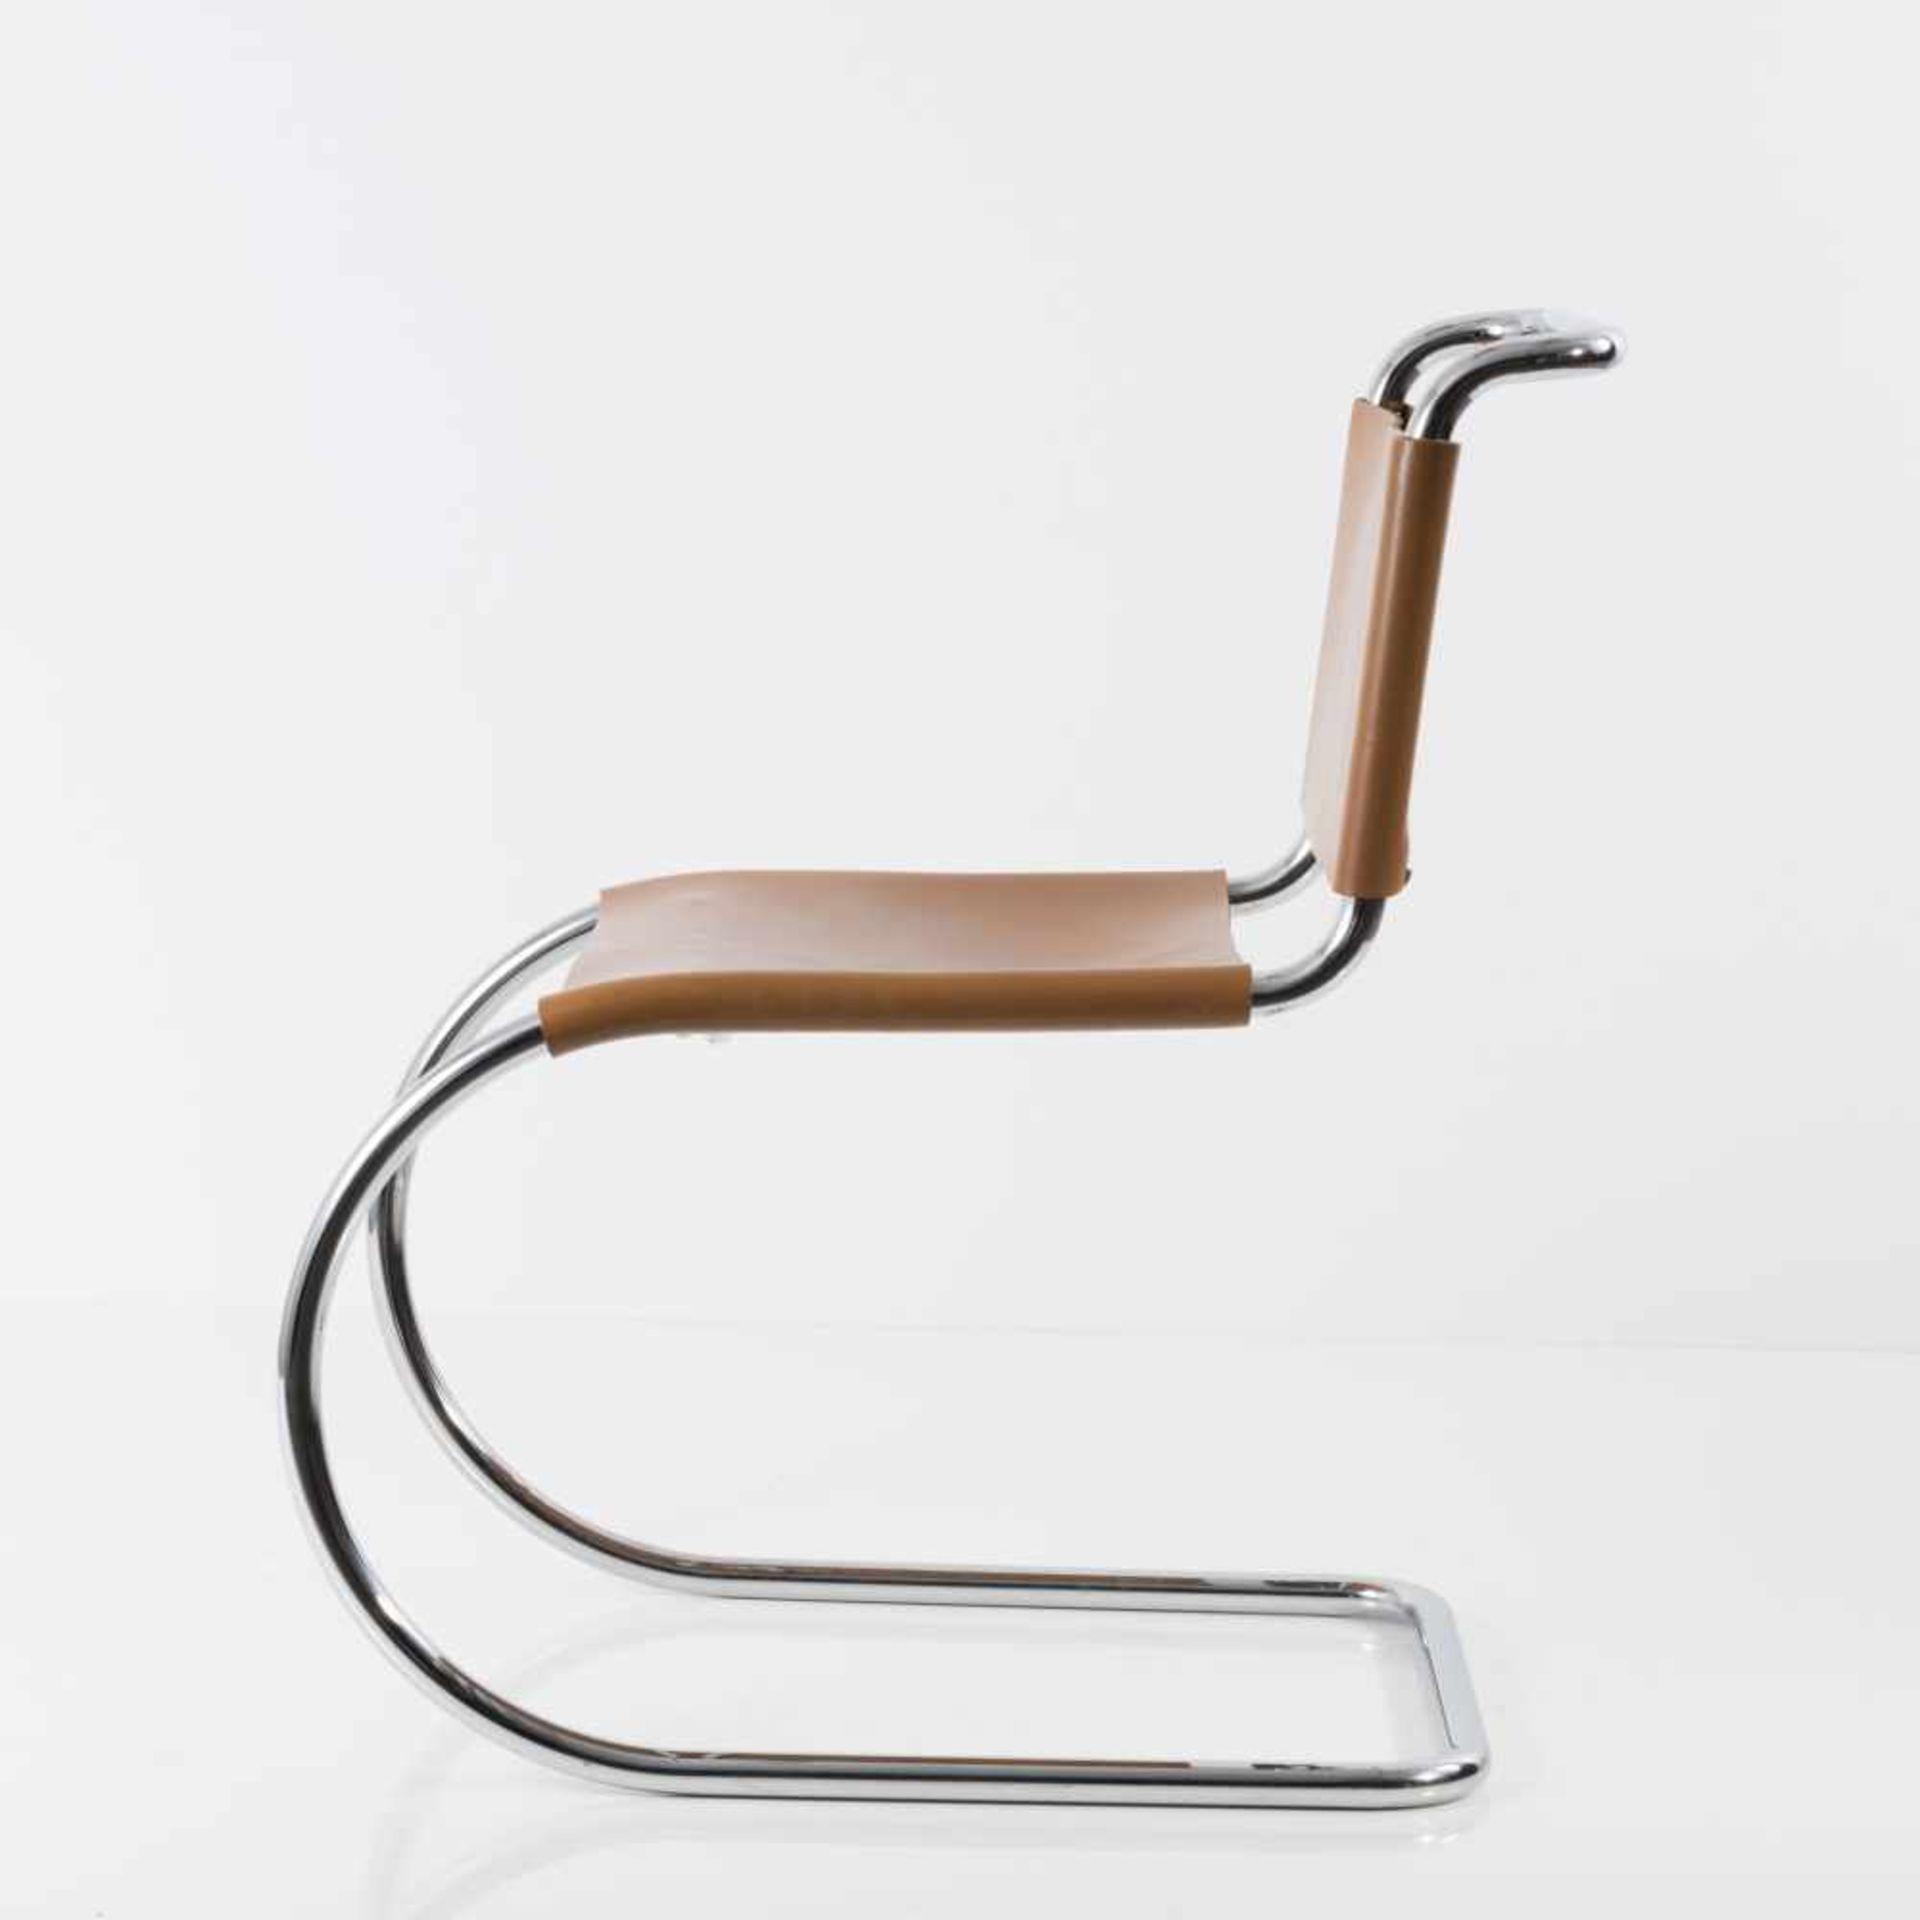 Ludwig Mies van der Rohe Sechs Stühle 'MR 10', 1927 H. 79 x 49 x 71 cm. Knoll International, New - Bild 5 aus 5